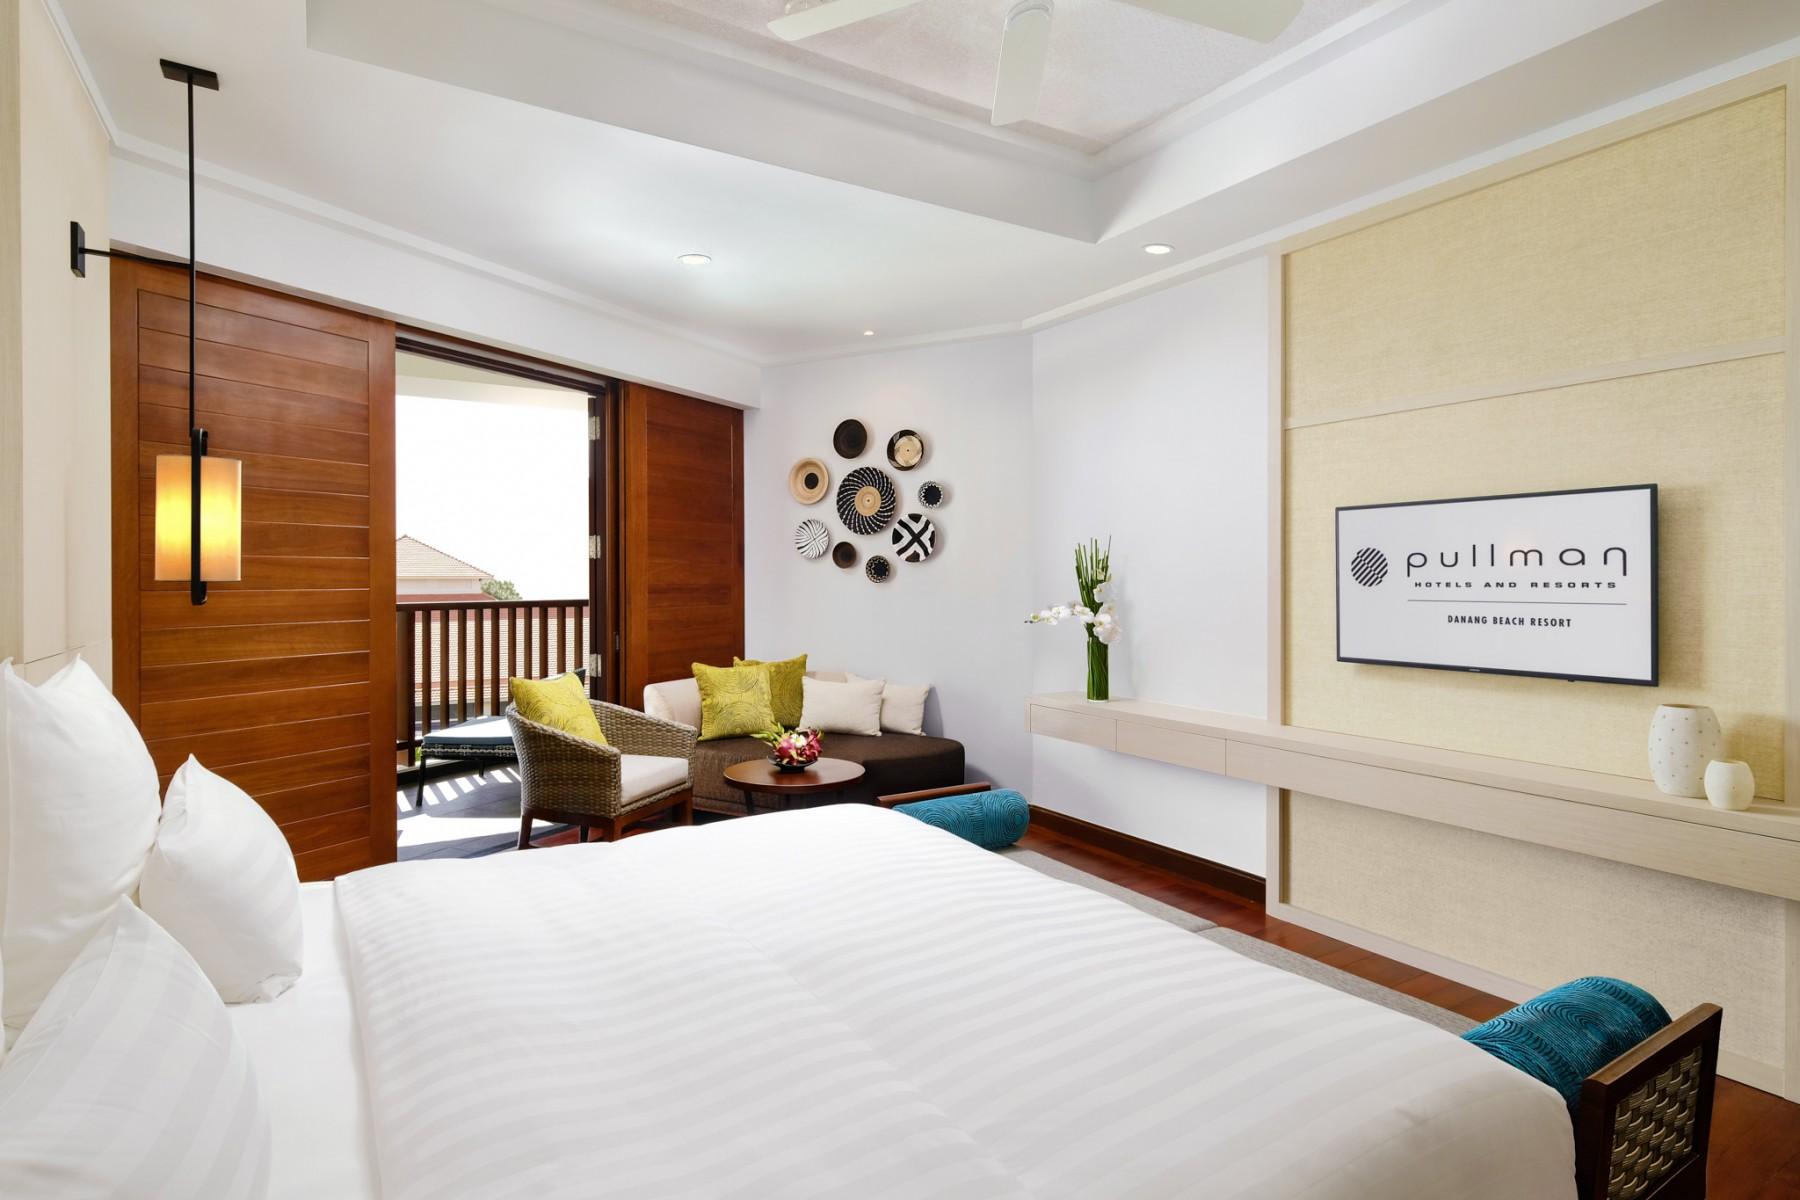 Pullman Danang Beach Resort Deluxe Room 5 Star Hotel